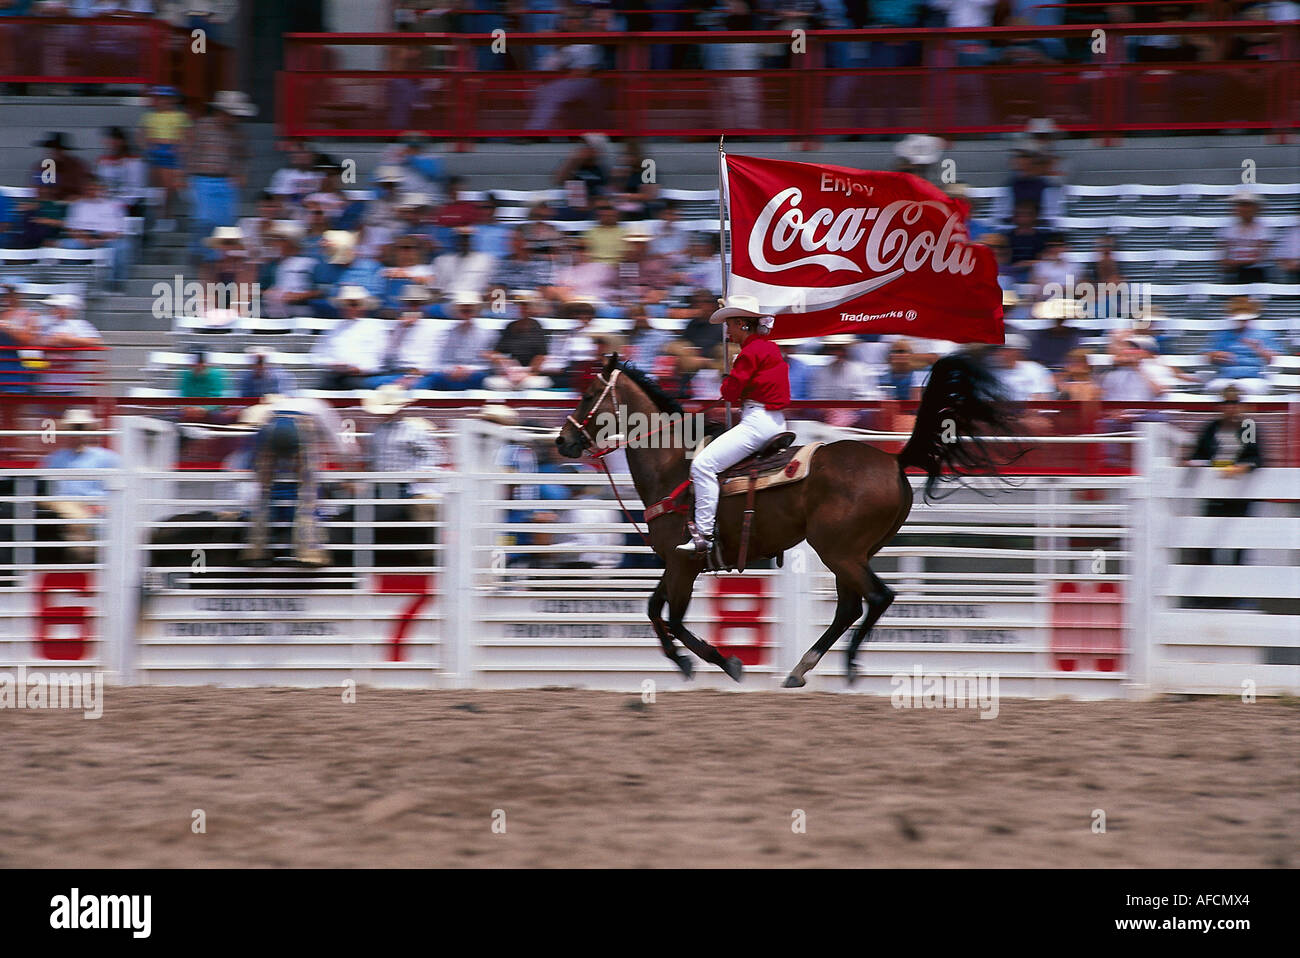 Cowboy, Rodeo, Coca-Cola Sponsor Flagge, Cheyenne Frontier Days Rodeo, Wyoming USA Stockbild